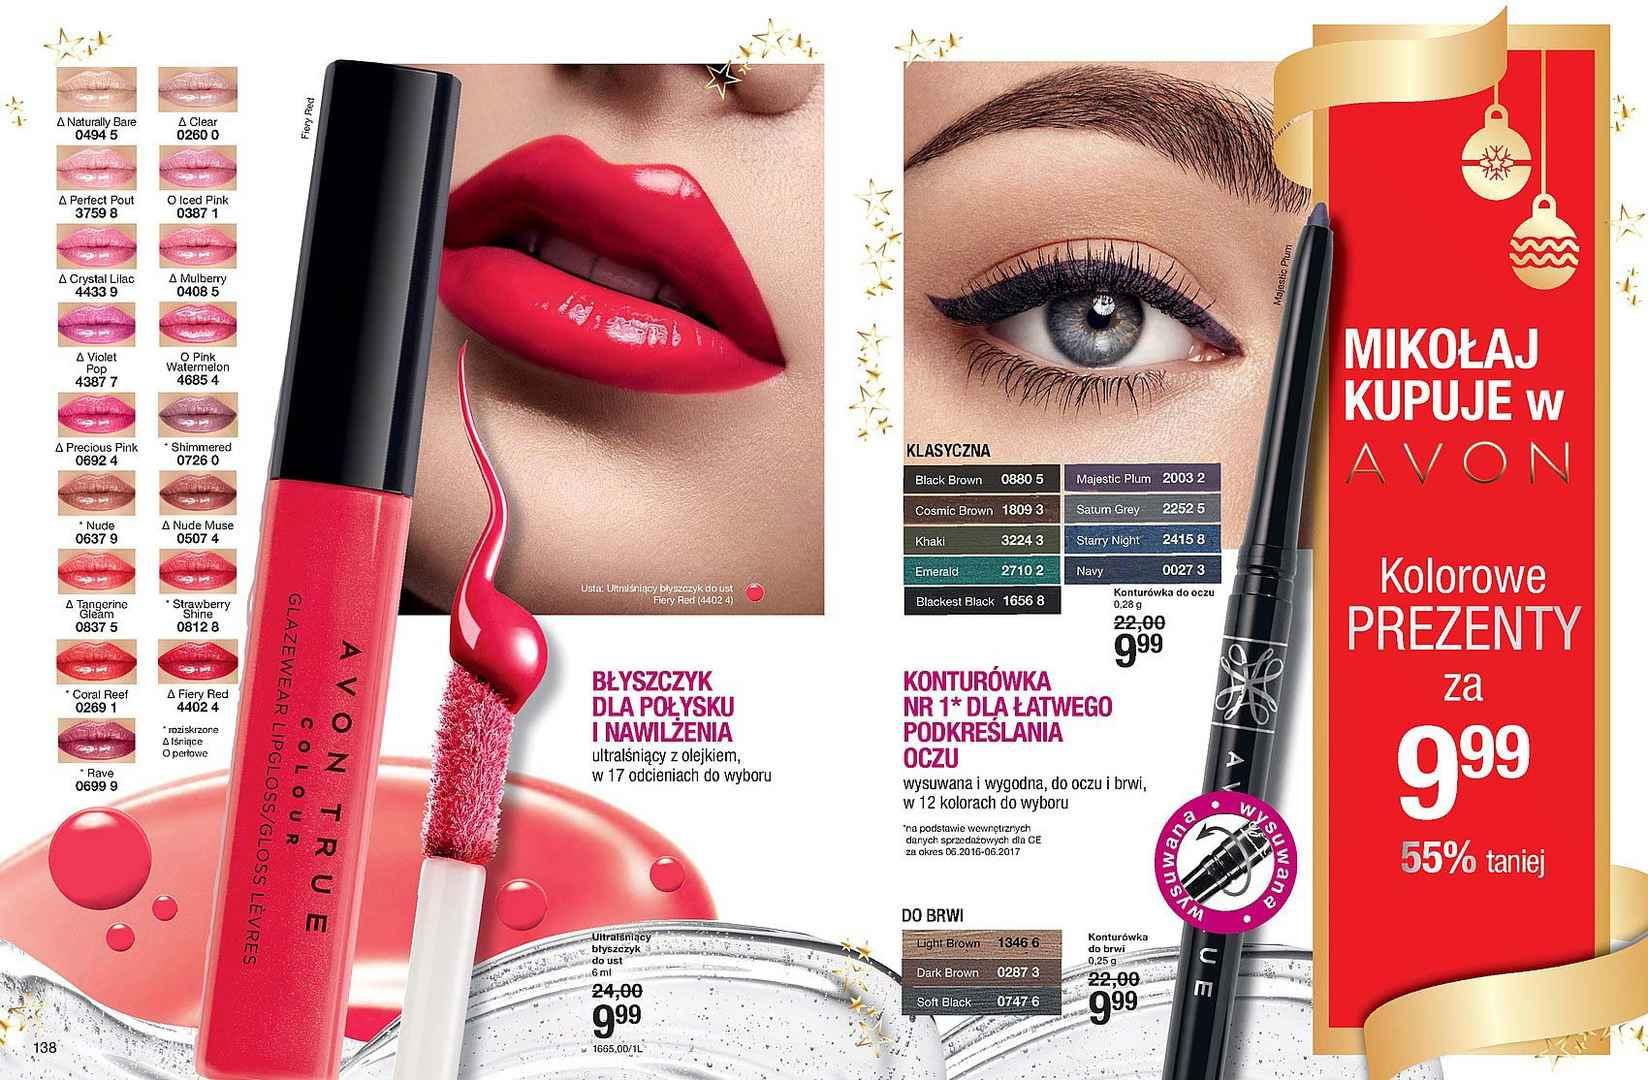 Avon katalog 16 2013 dodatek купить line marvel косметика